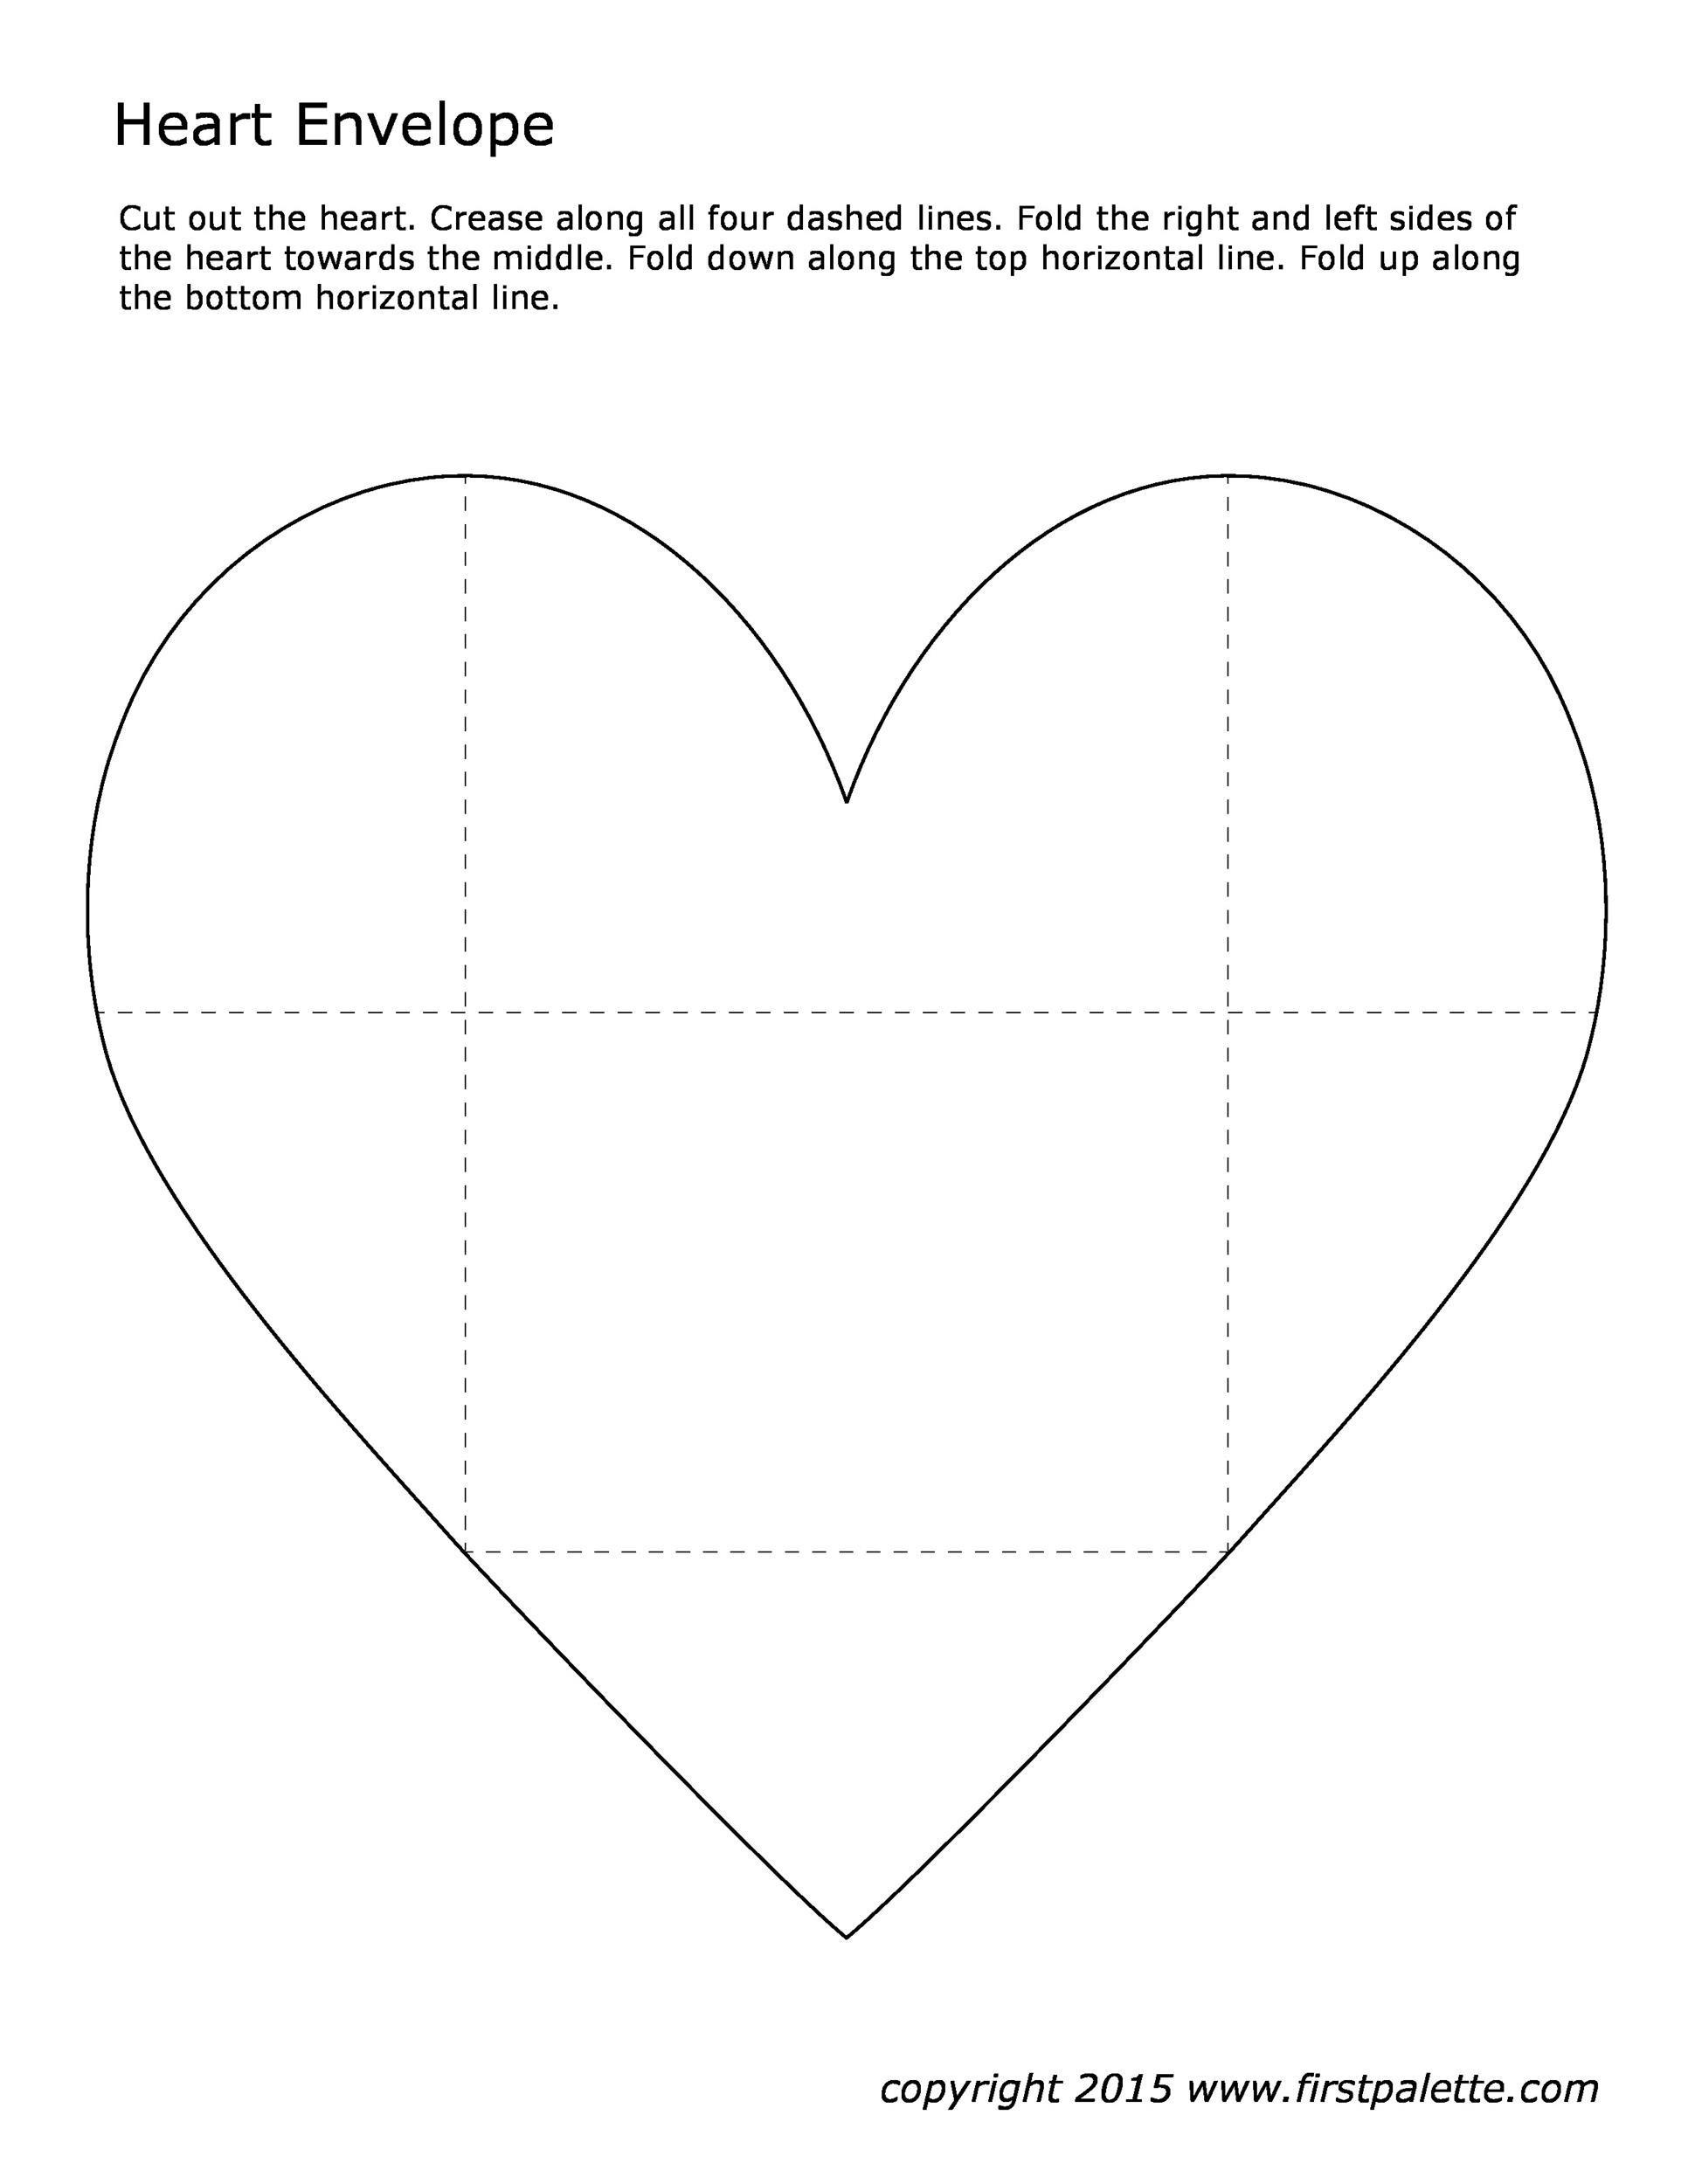 40 Free Envelope Templates Word Templatelab